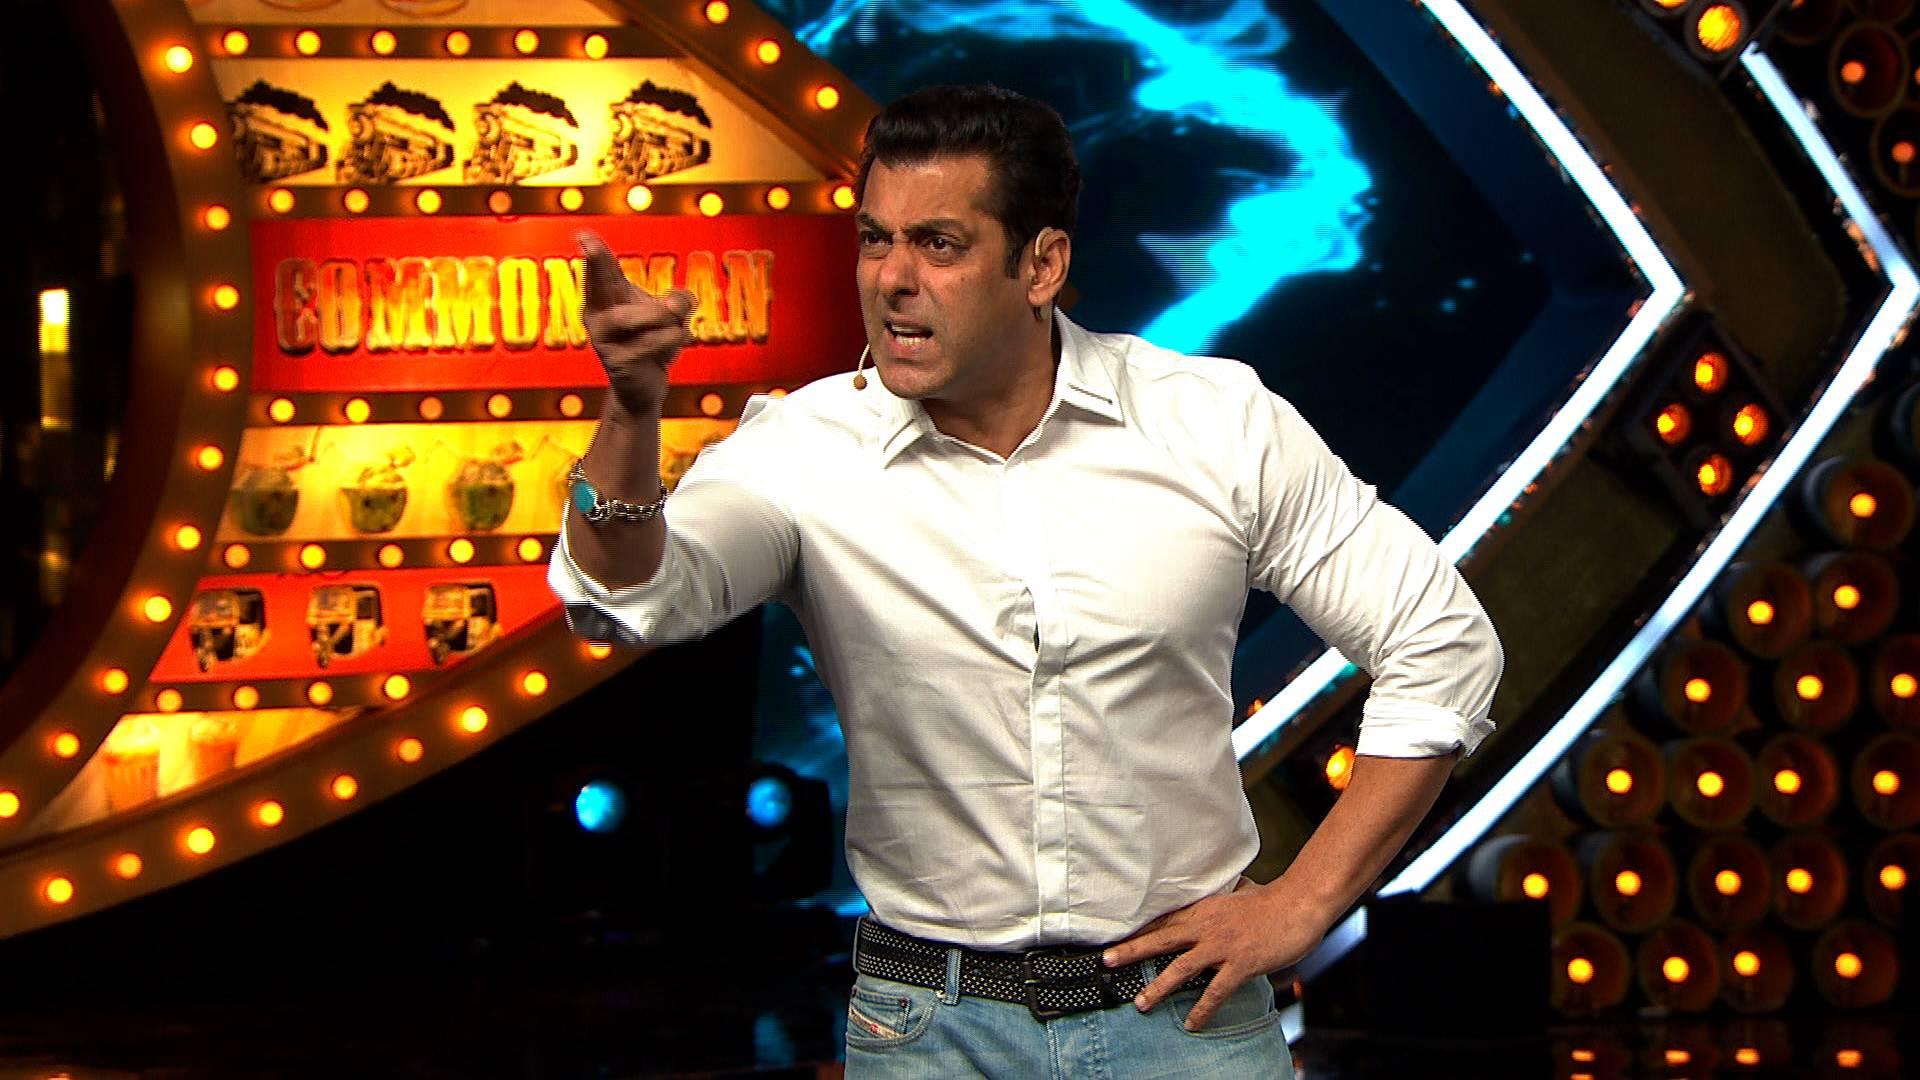 Salman, Khan, Slap, bodyguard, Fan, Bharat, NewsMobile, Mobile, News, India, Entertainment, India